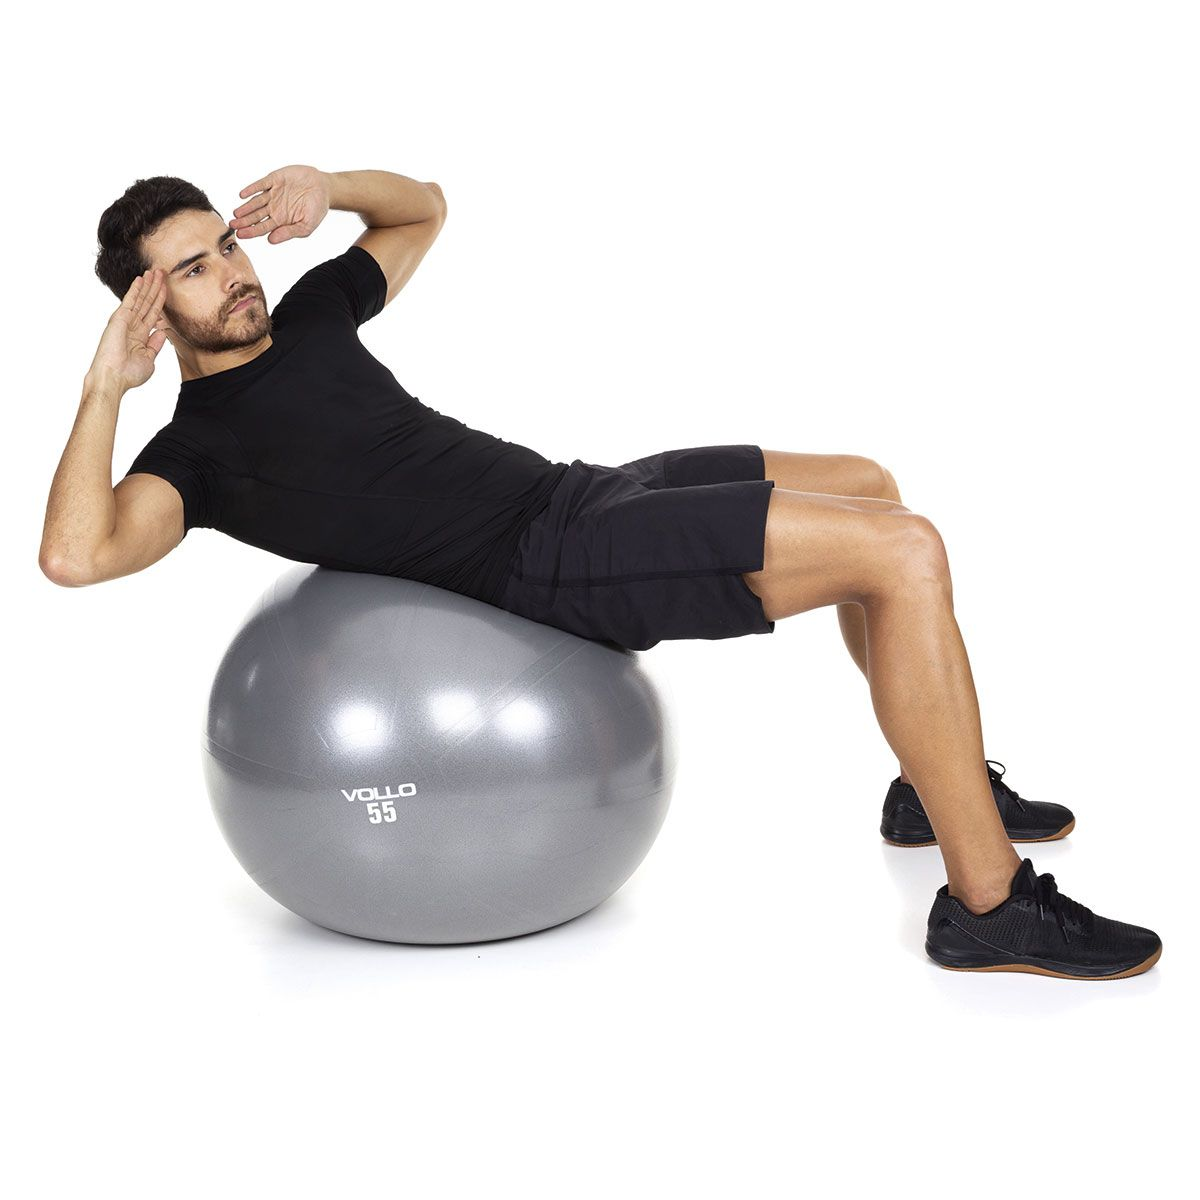 Bola Pilates Gym Ball Com Bomba 55 Cm Cinza Vollo